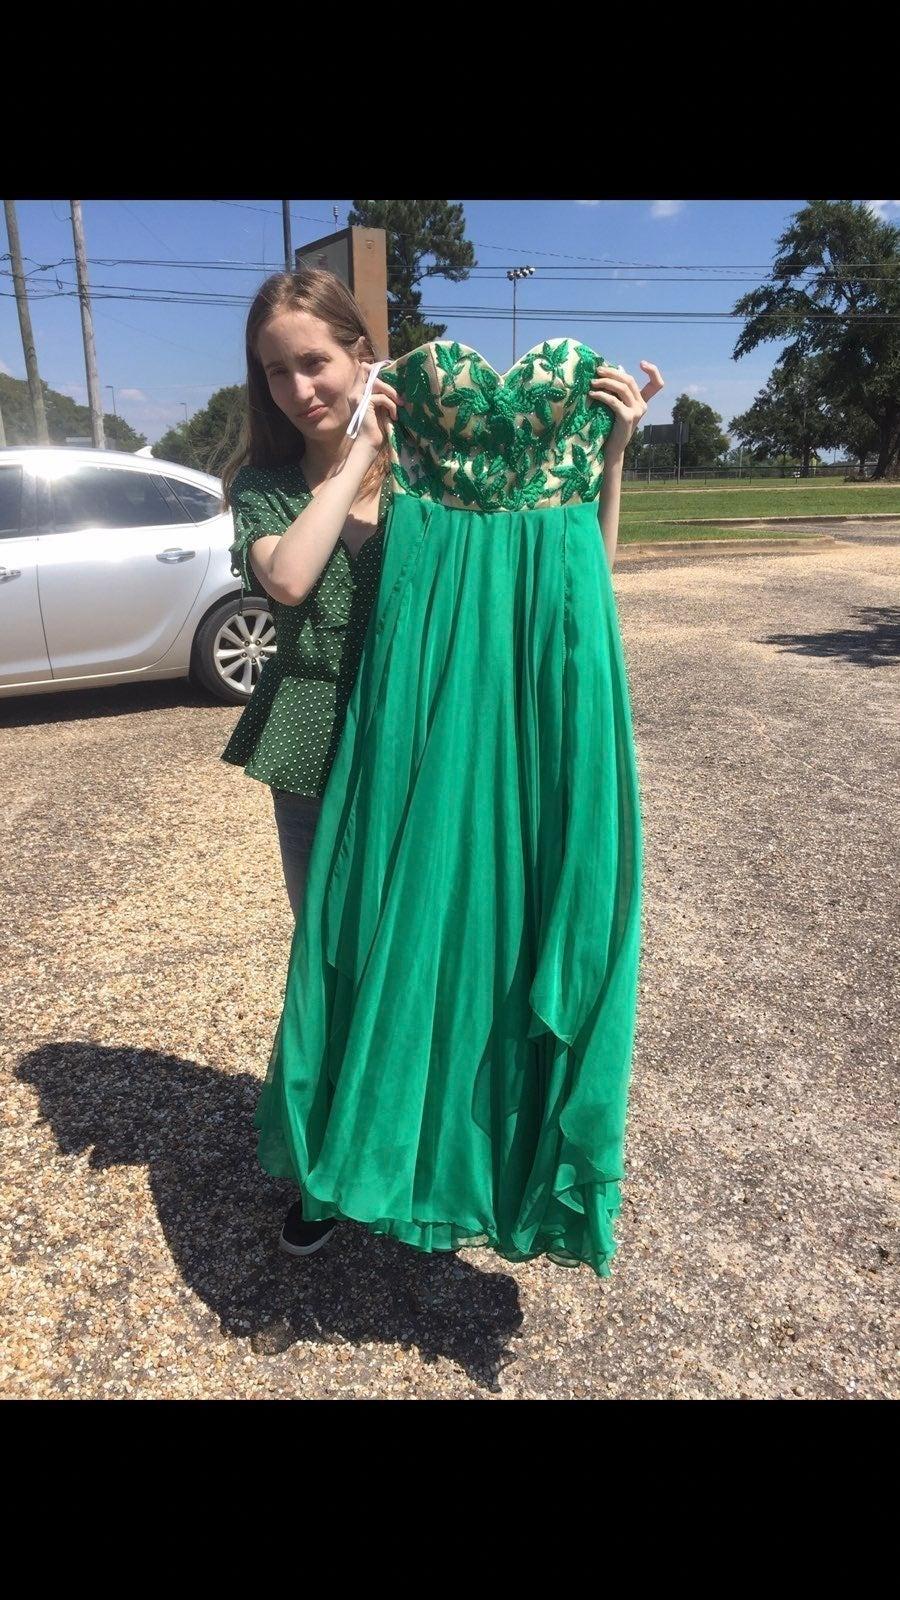 *BEAUTIFUL* green Sherri Hill dress